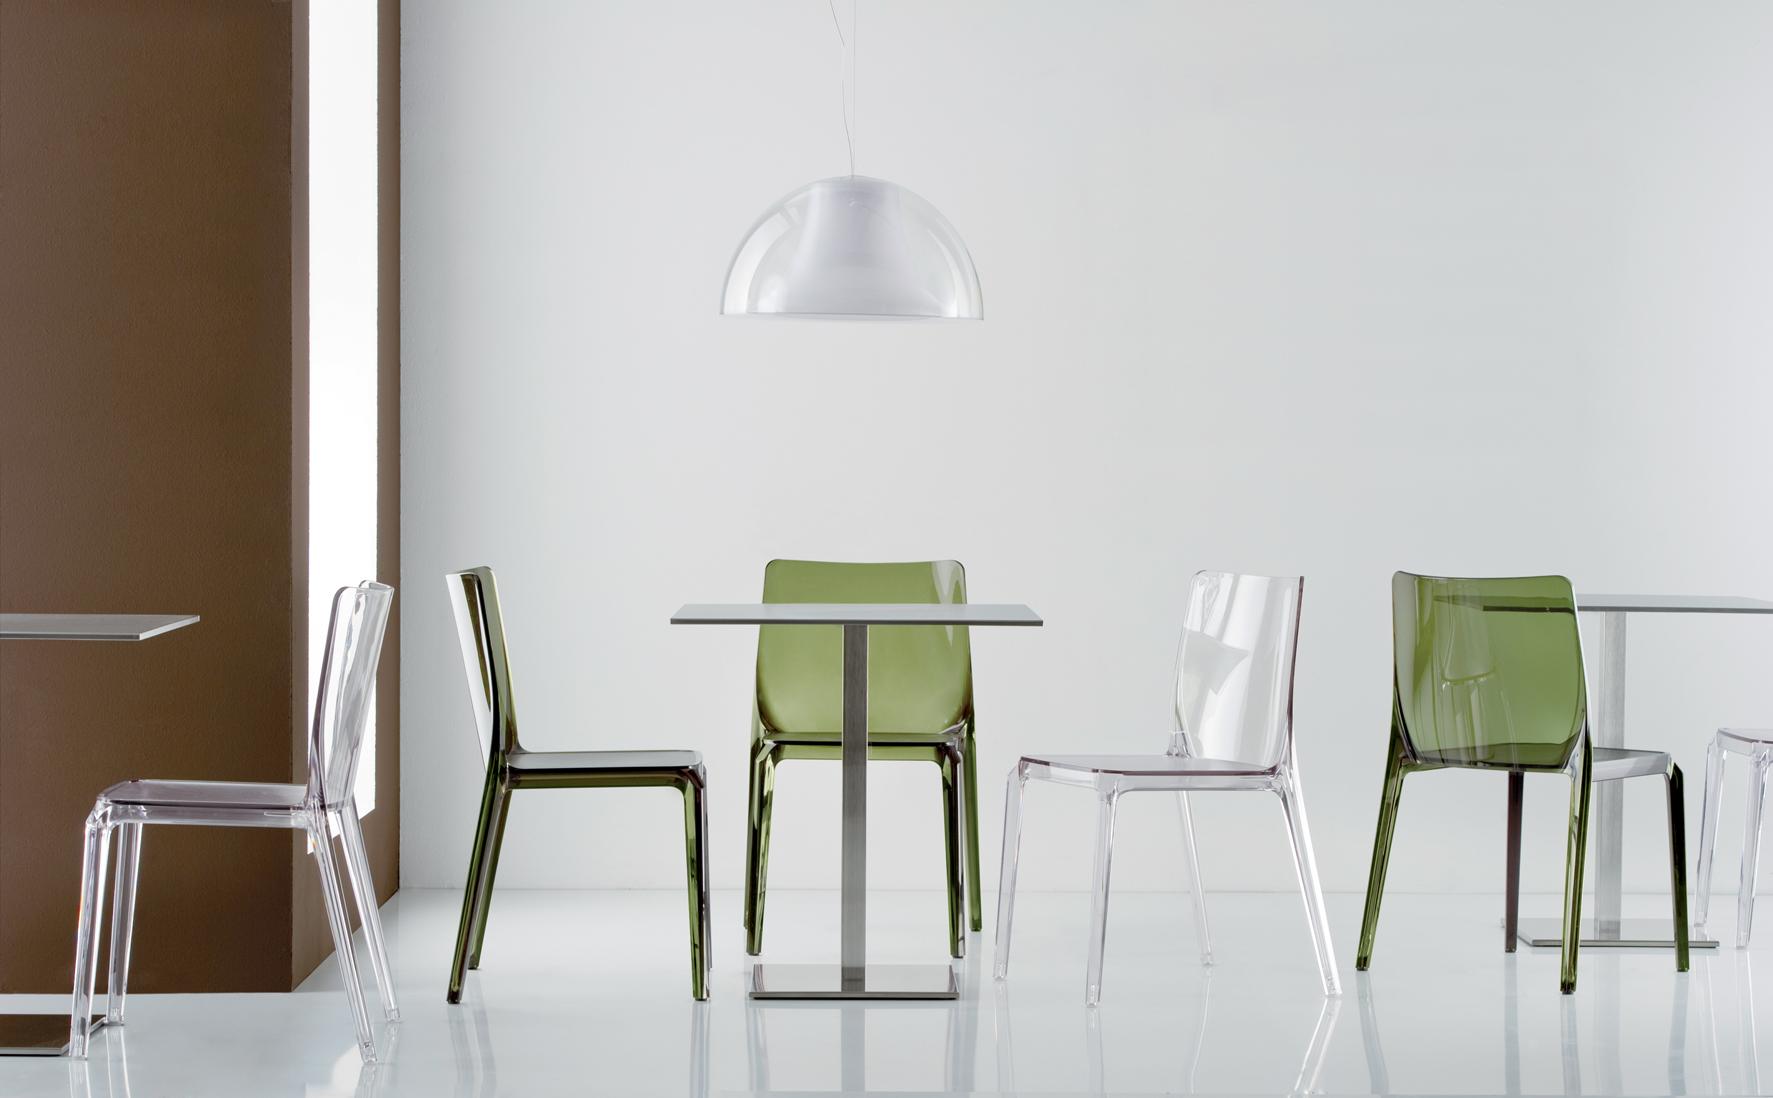 krzesło plastikowe pedrali blitz 640 ideal design